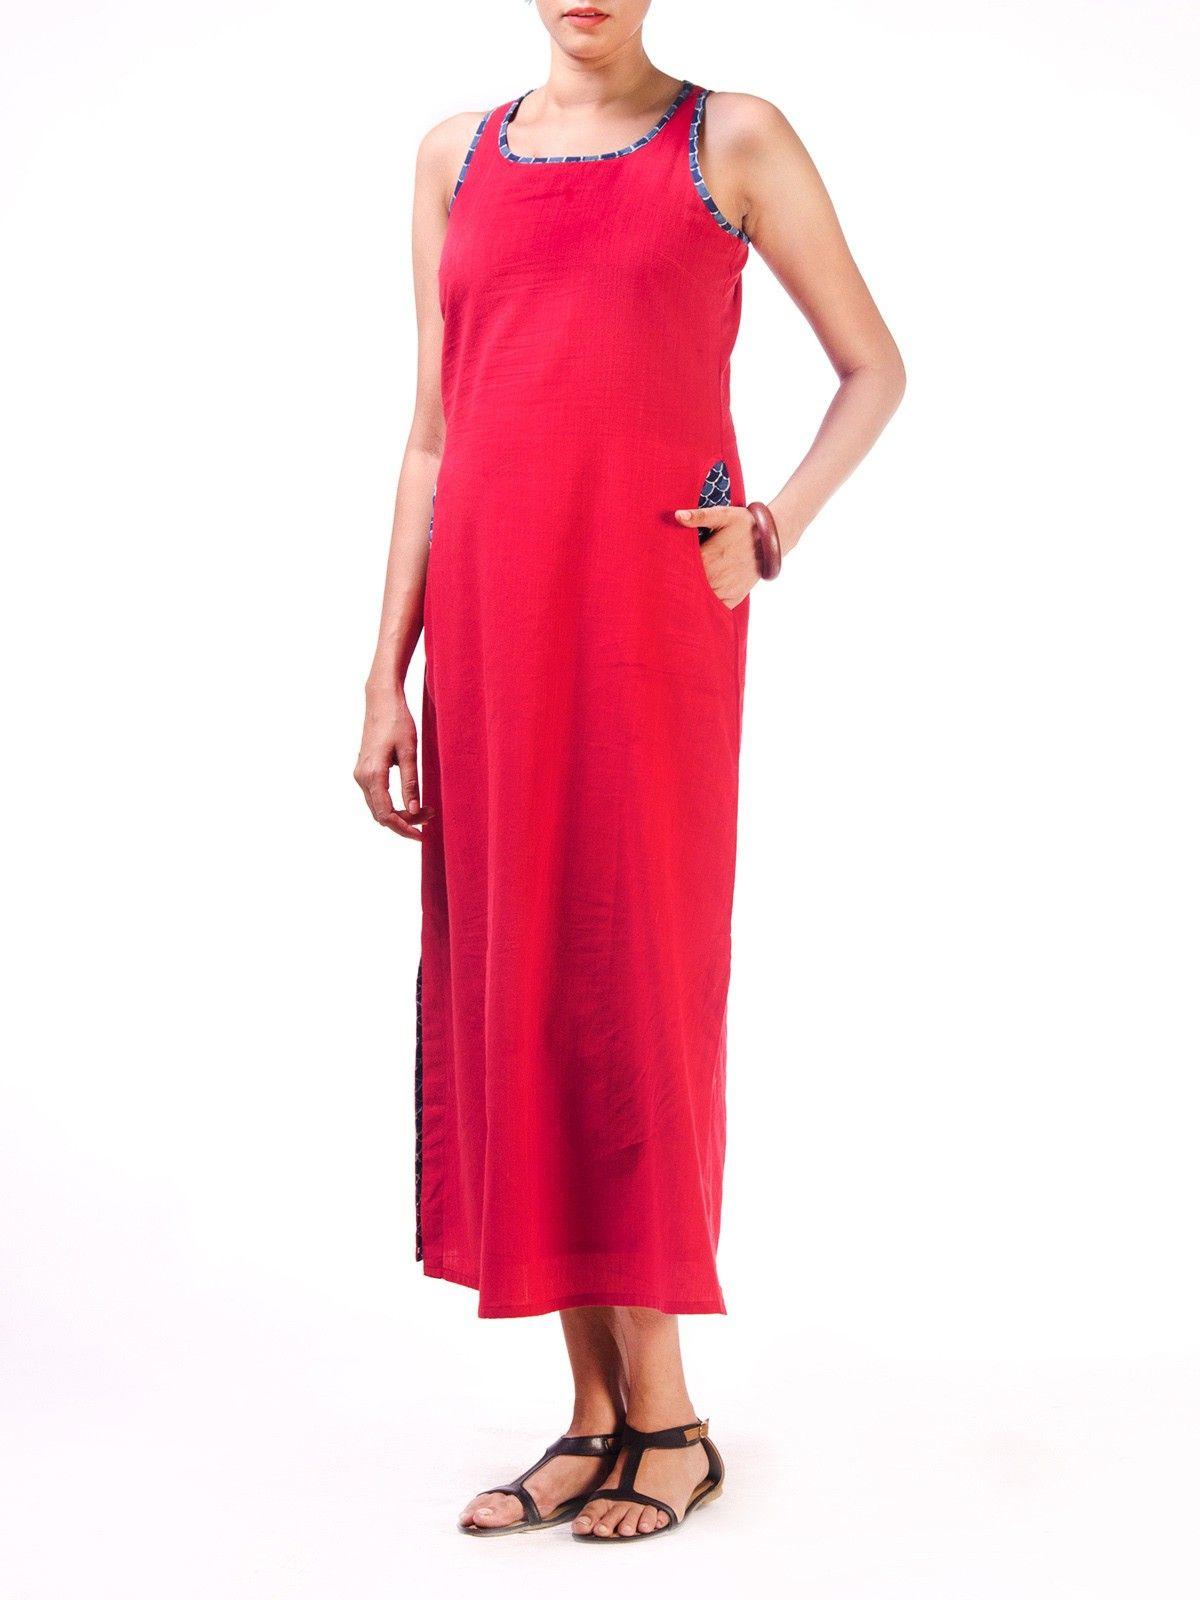 Coral Long Razerback Long Dress with Block Printed Pocket Detail